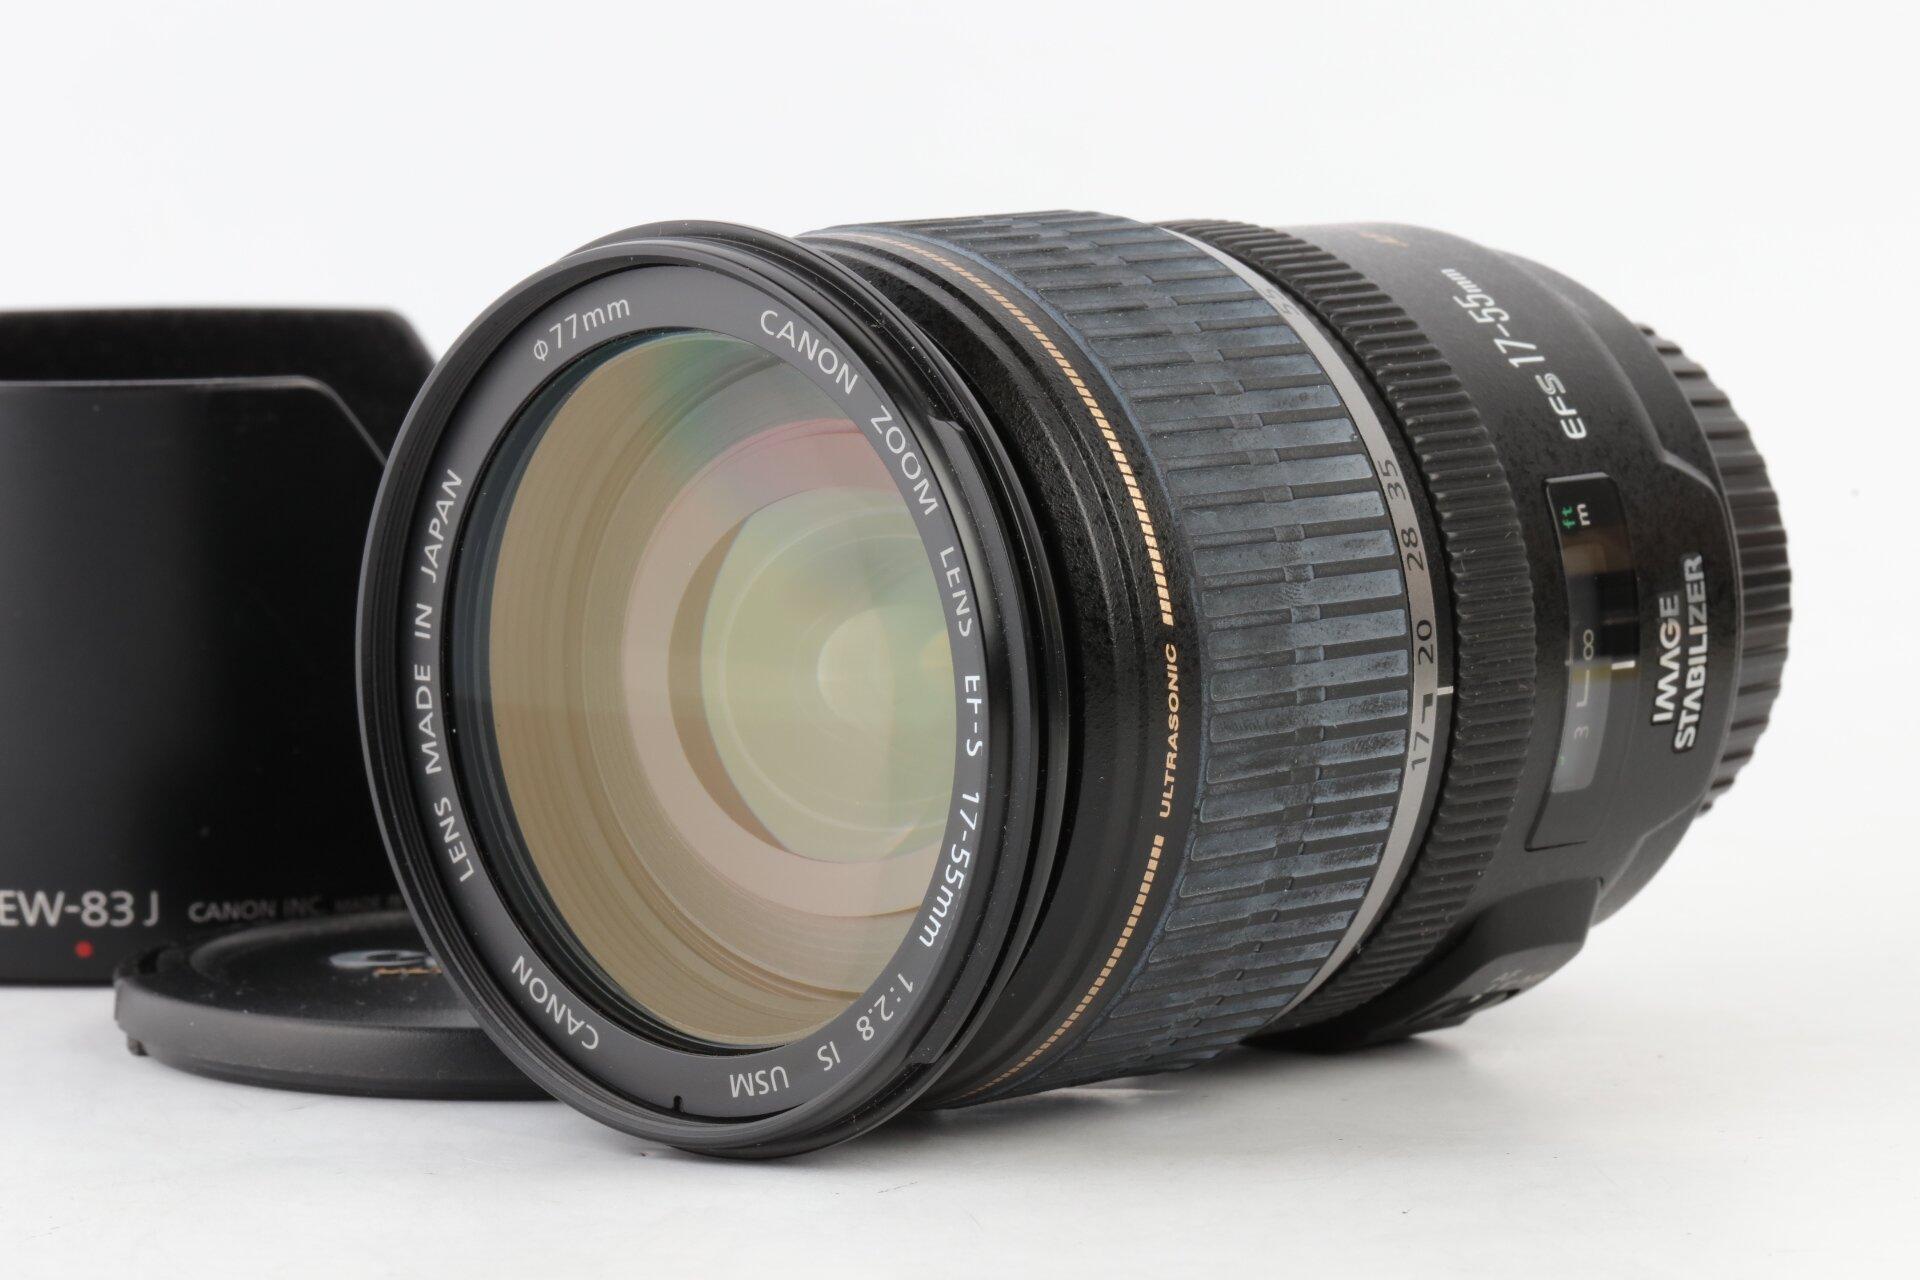 Canon EF-S 17-55mm 2,8 USM